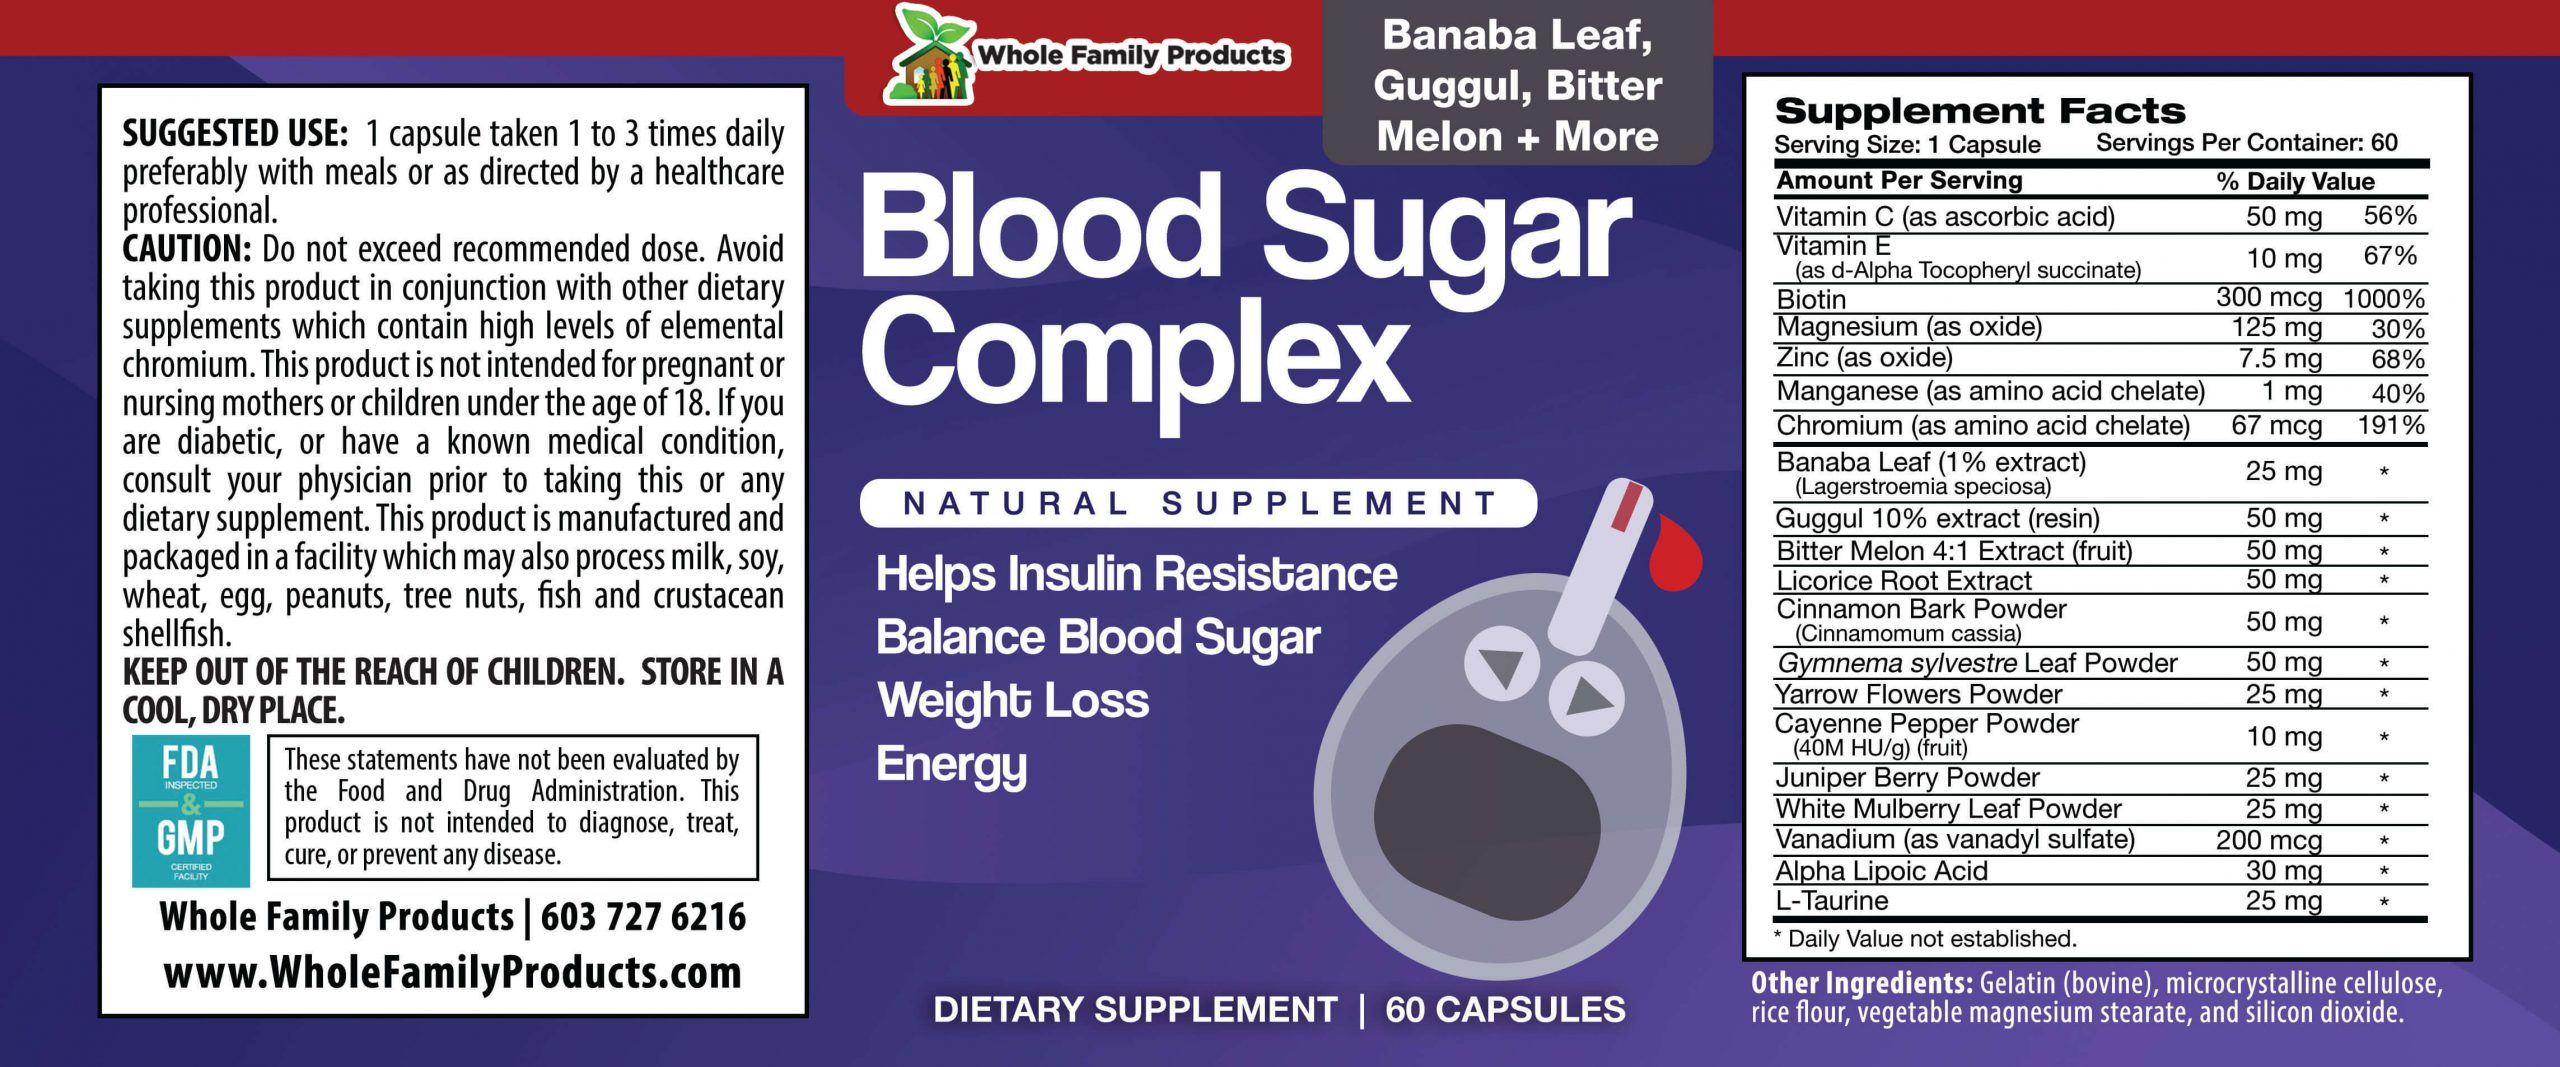 Blood Sugar Complex 60 Capsules Product Label